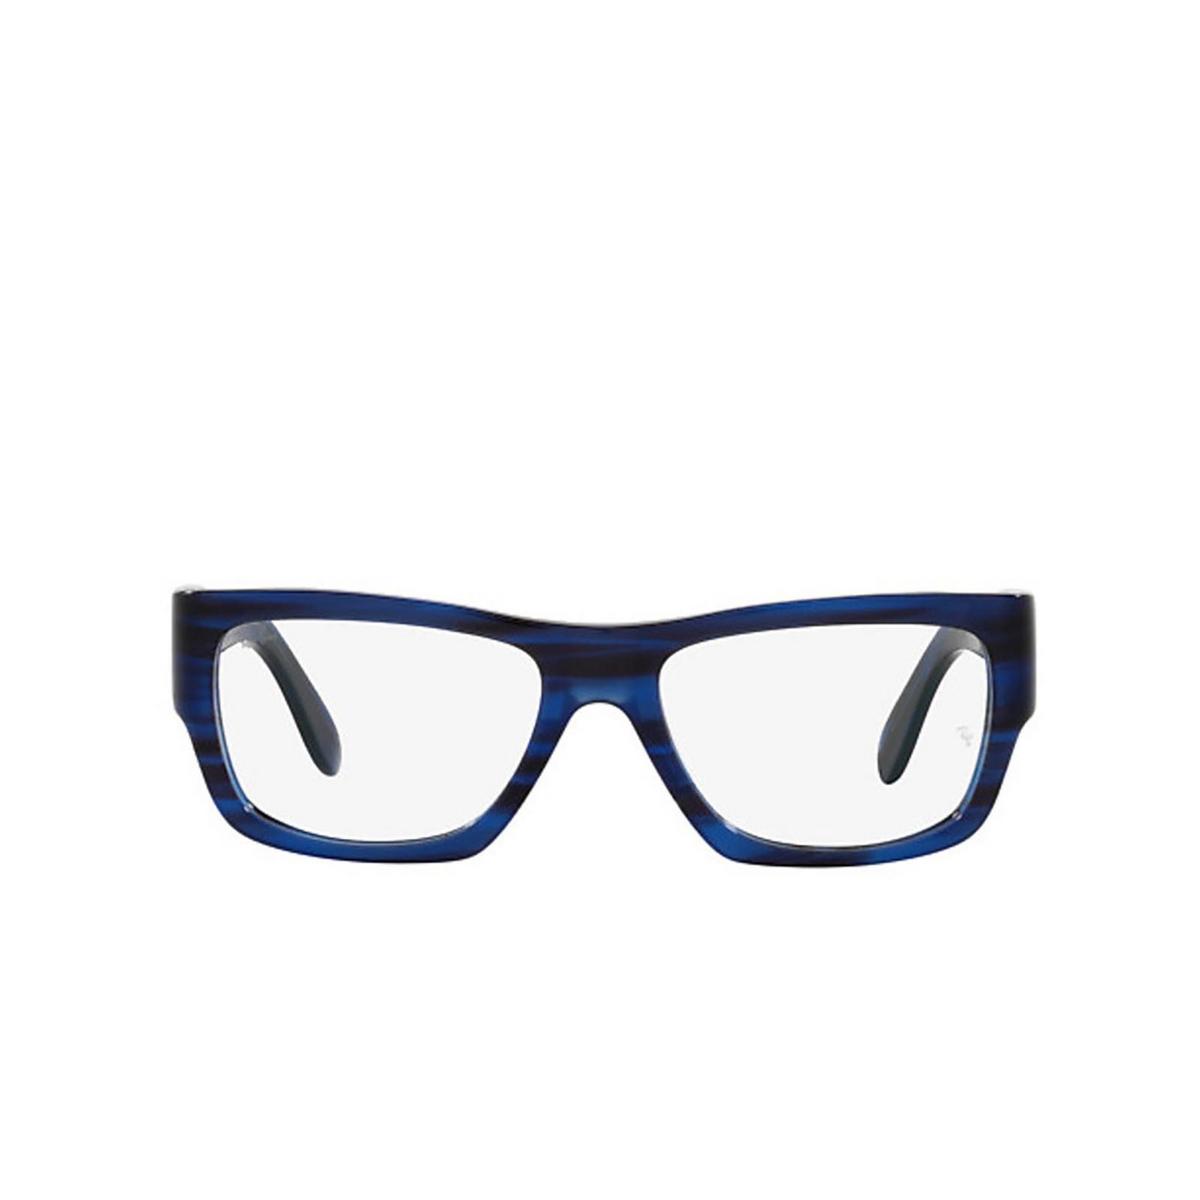 Ray-Ban® Square Eyeglasses: Nomad Wayfarer RX5487 color Striped Blue 8053.